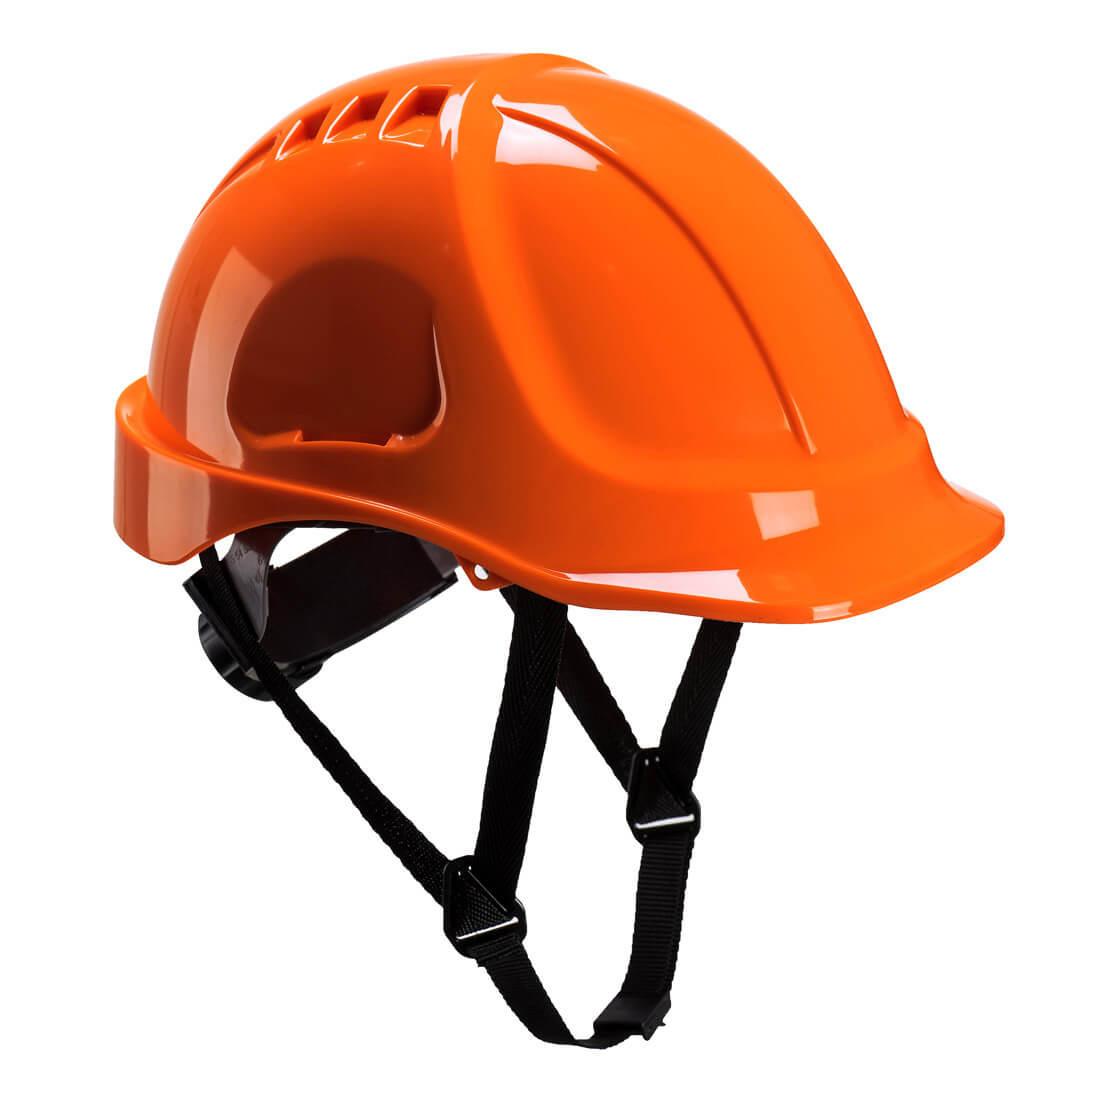 Casca Endurace Plus - Echipamente de protectie personala